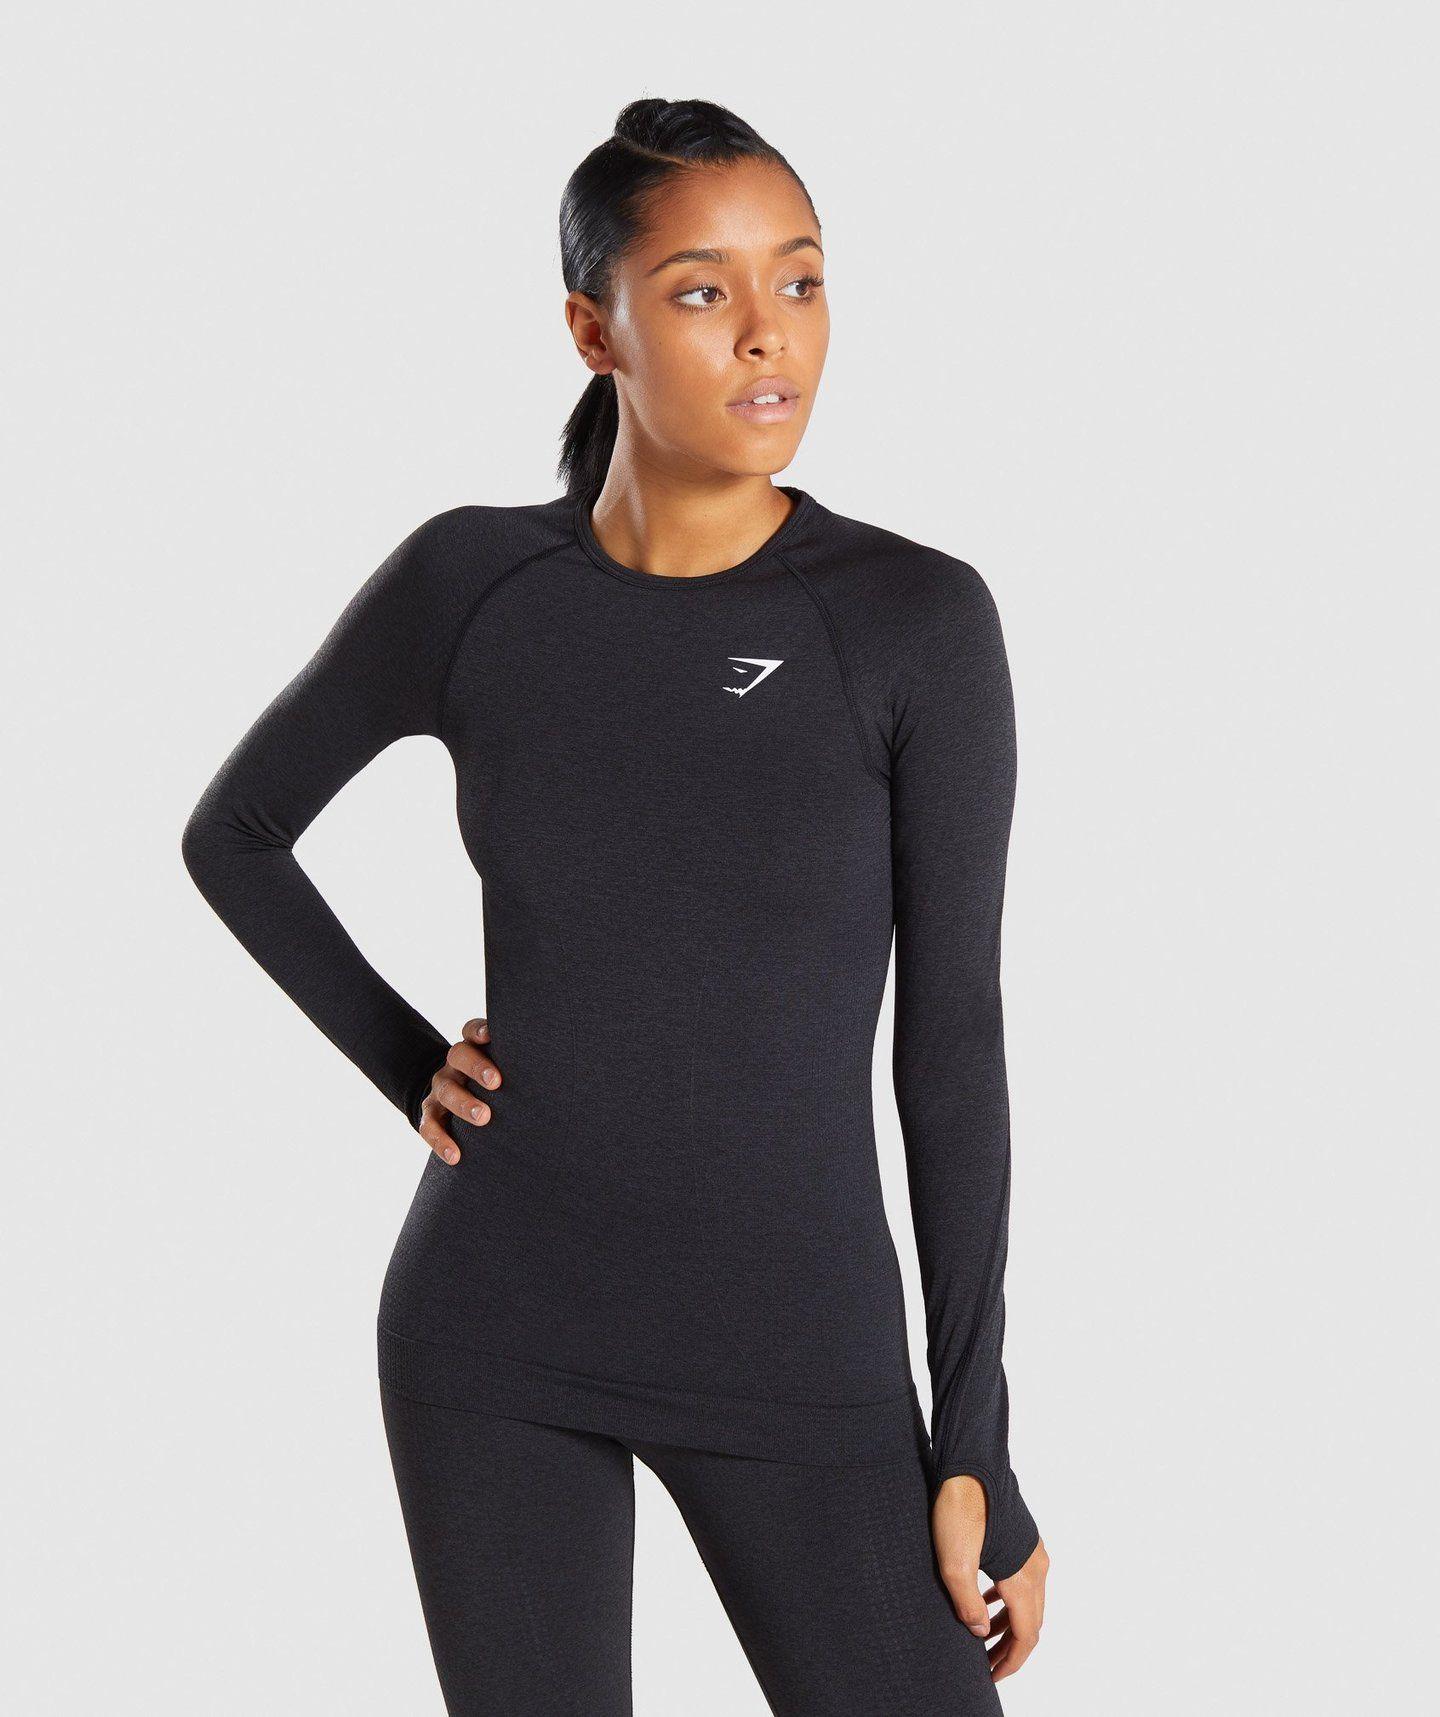 b0caddd6a Full Length Black Marl Vital Seamless Long Sleeve T-Shirt From Front 4